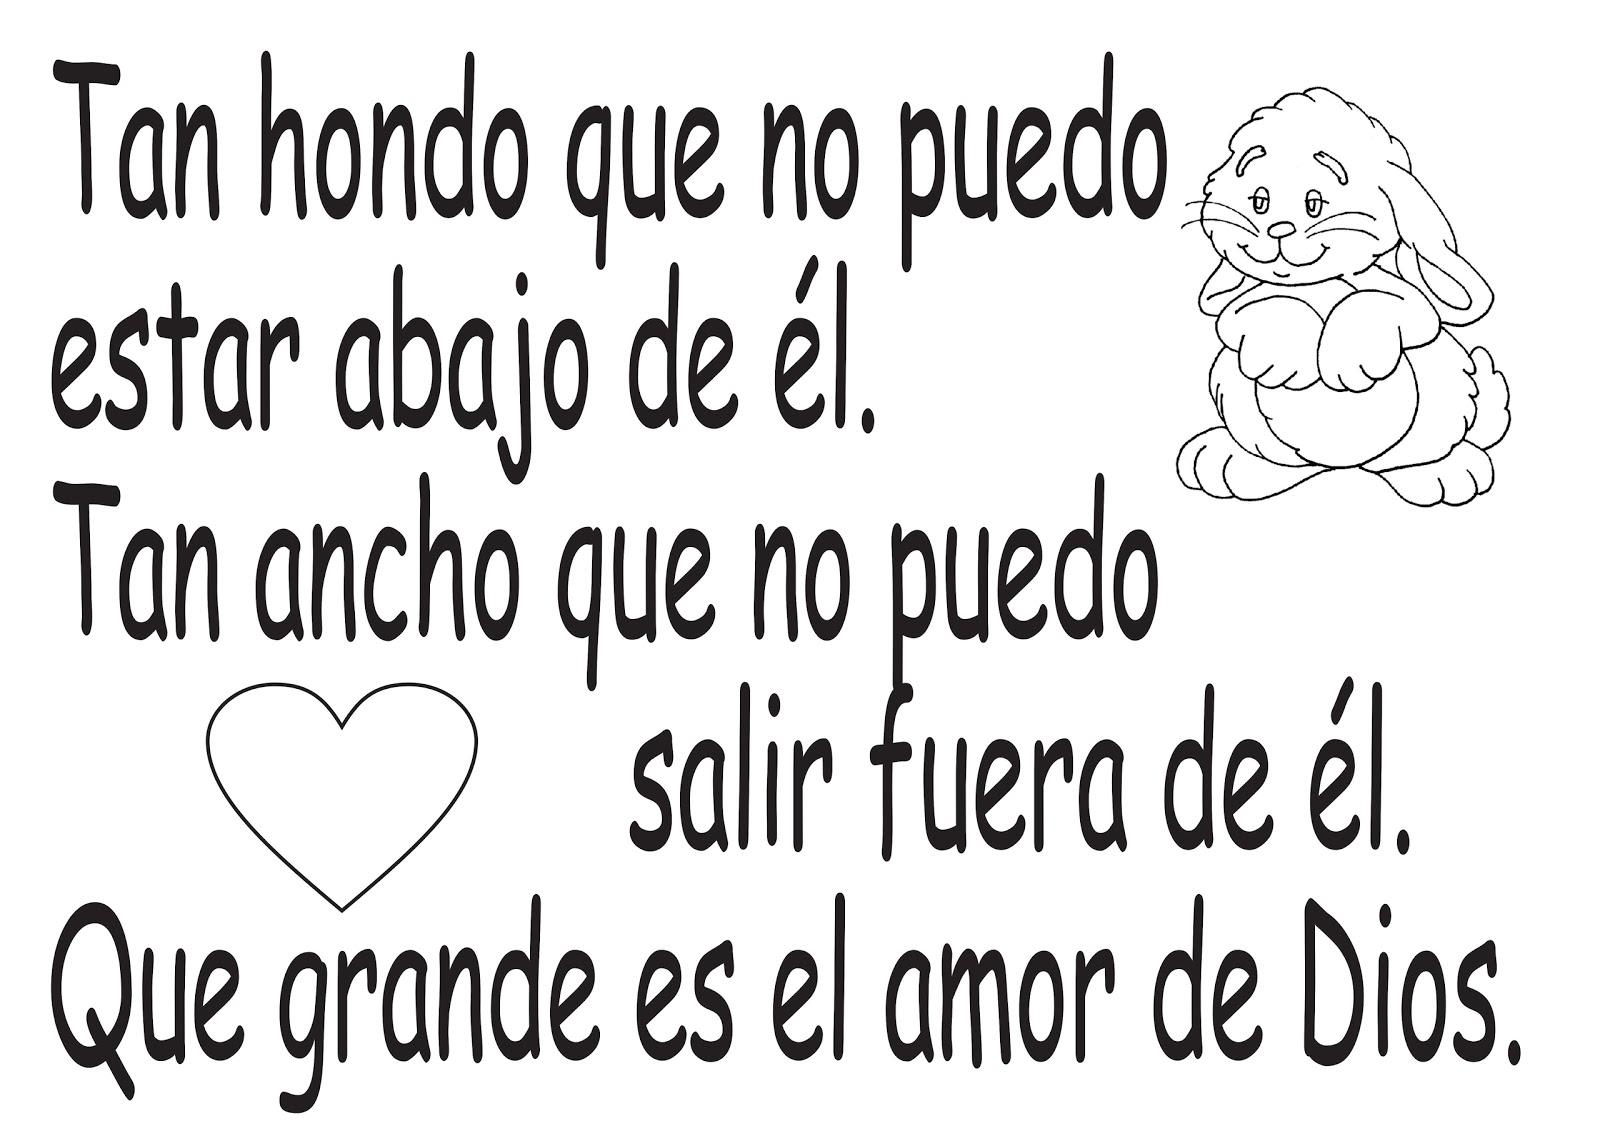 http://2.bp.blogspot.com/-luhwerk2CuE/TcoQRaLv1HI/AAAAAAAAAO0/VZYvHonILJs/s1600/el+amor+de+Dios+es+maravilloso2.jpg